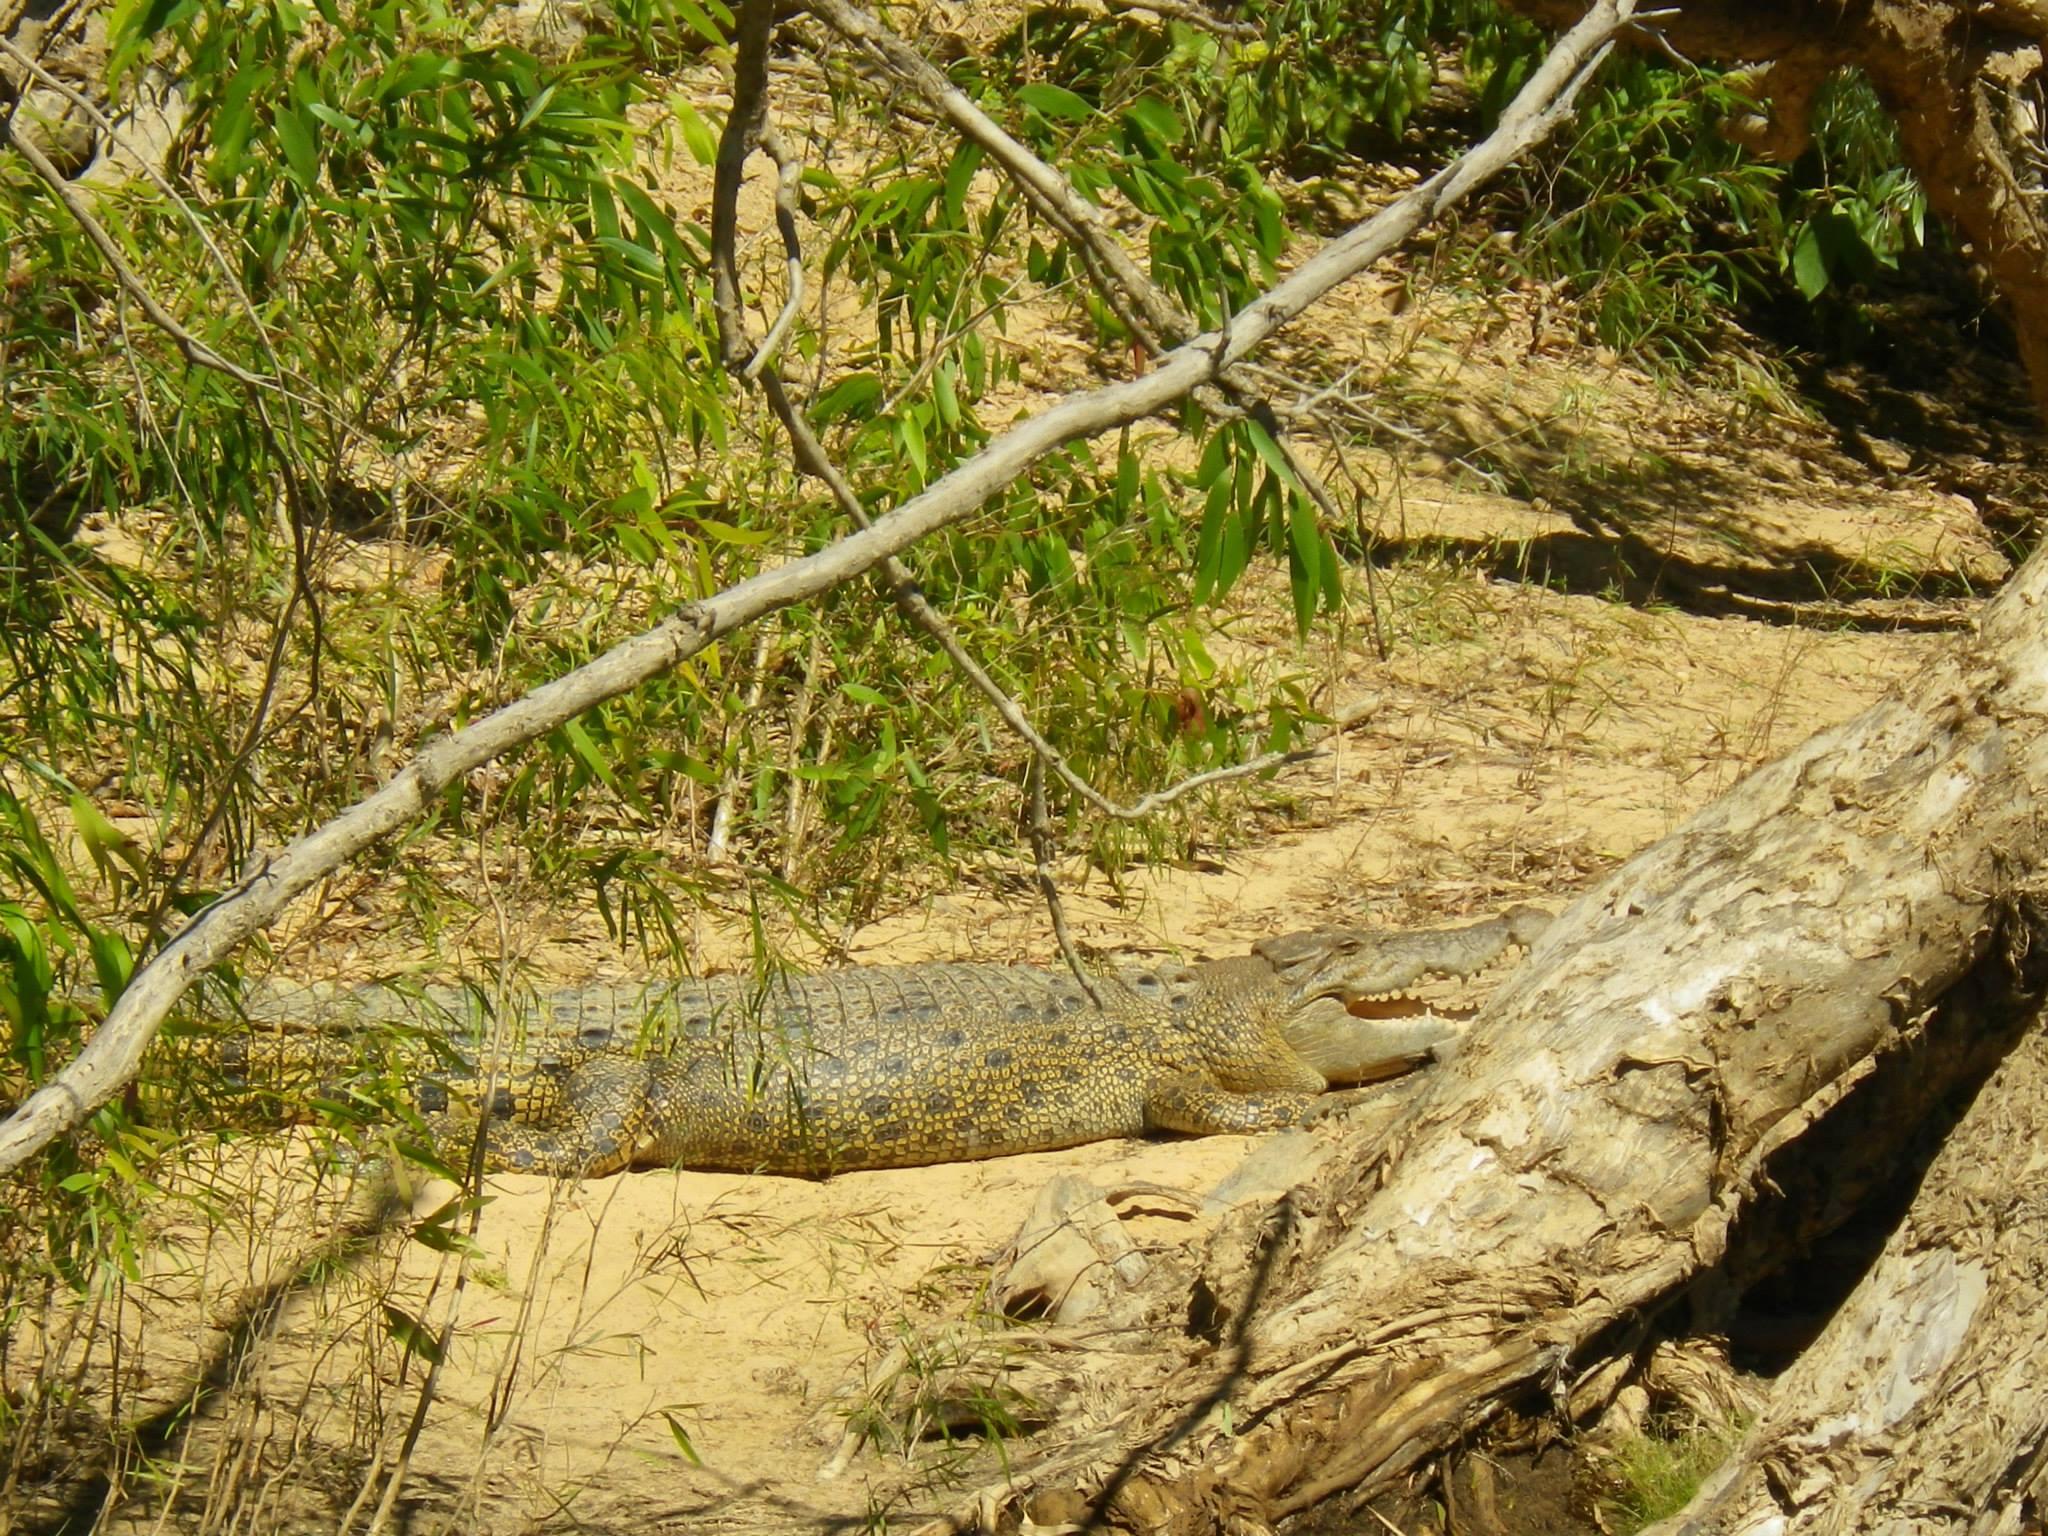 crocodile mary river australie